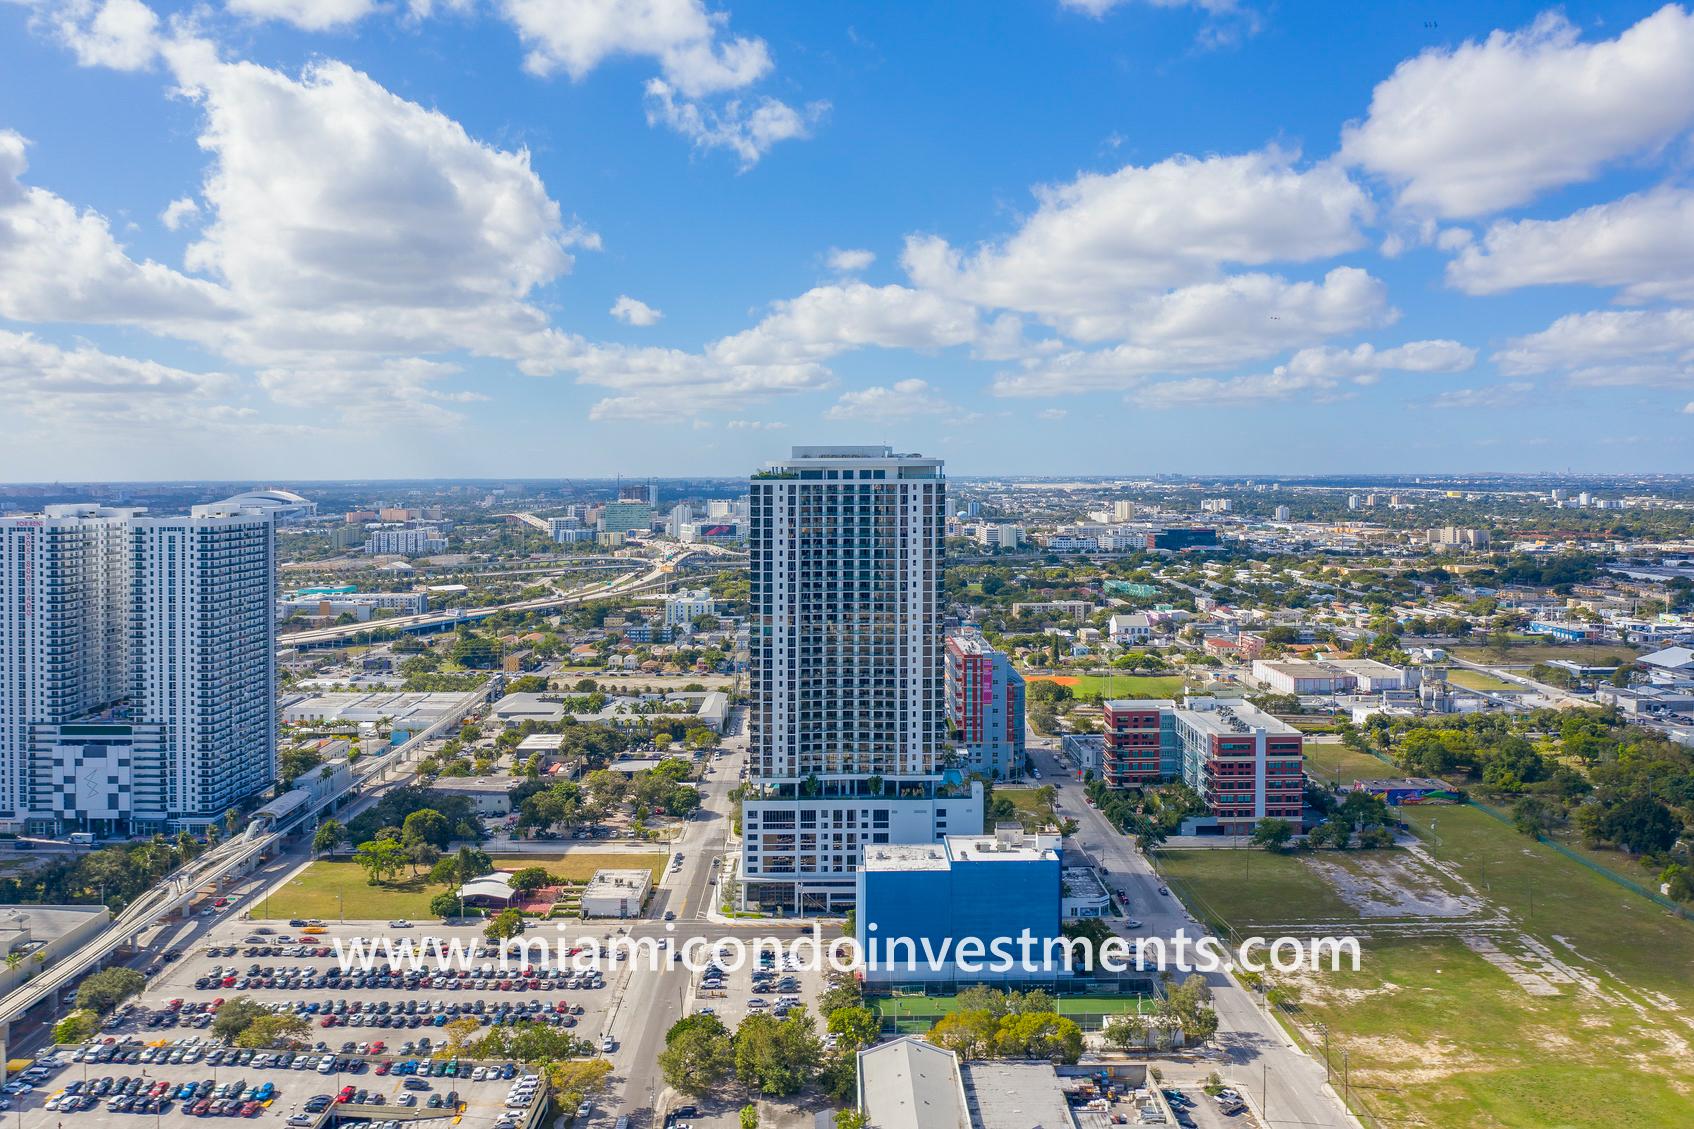 Canvas Miami condominiums